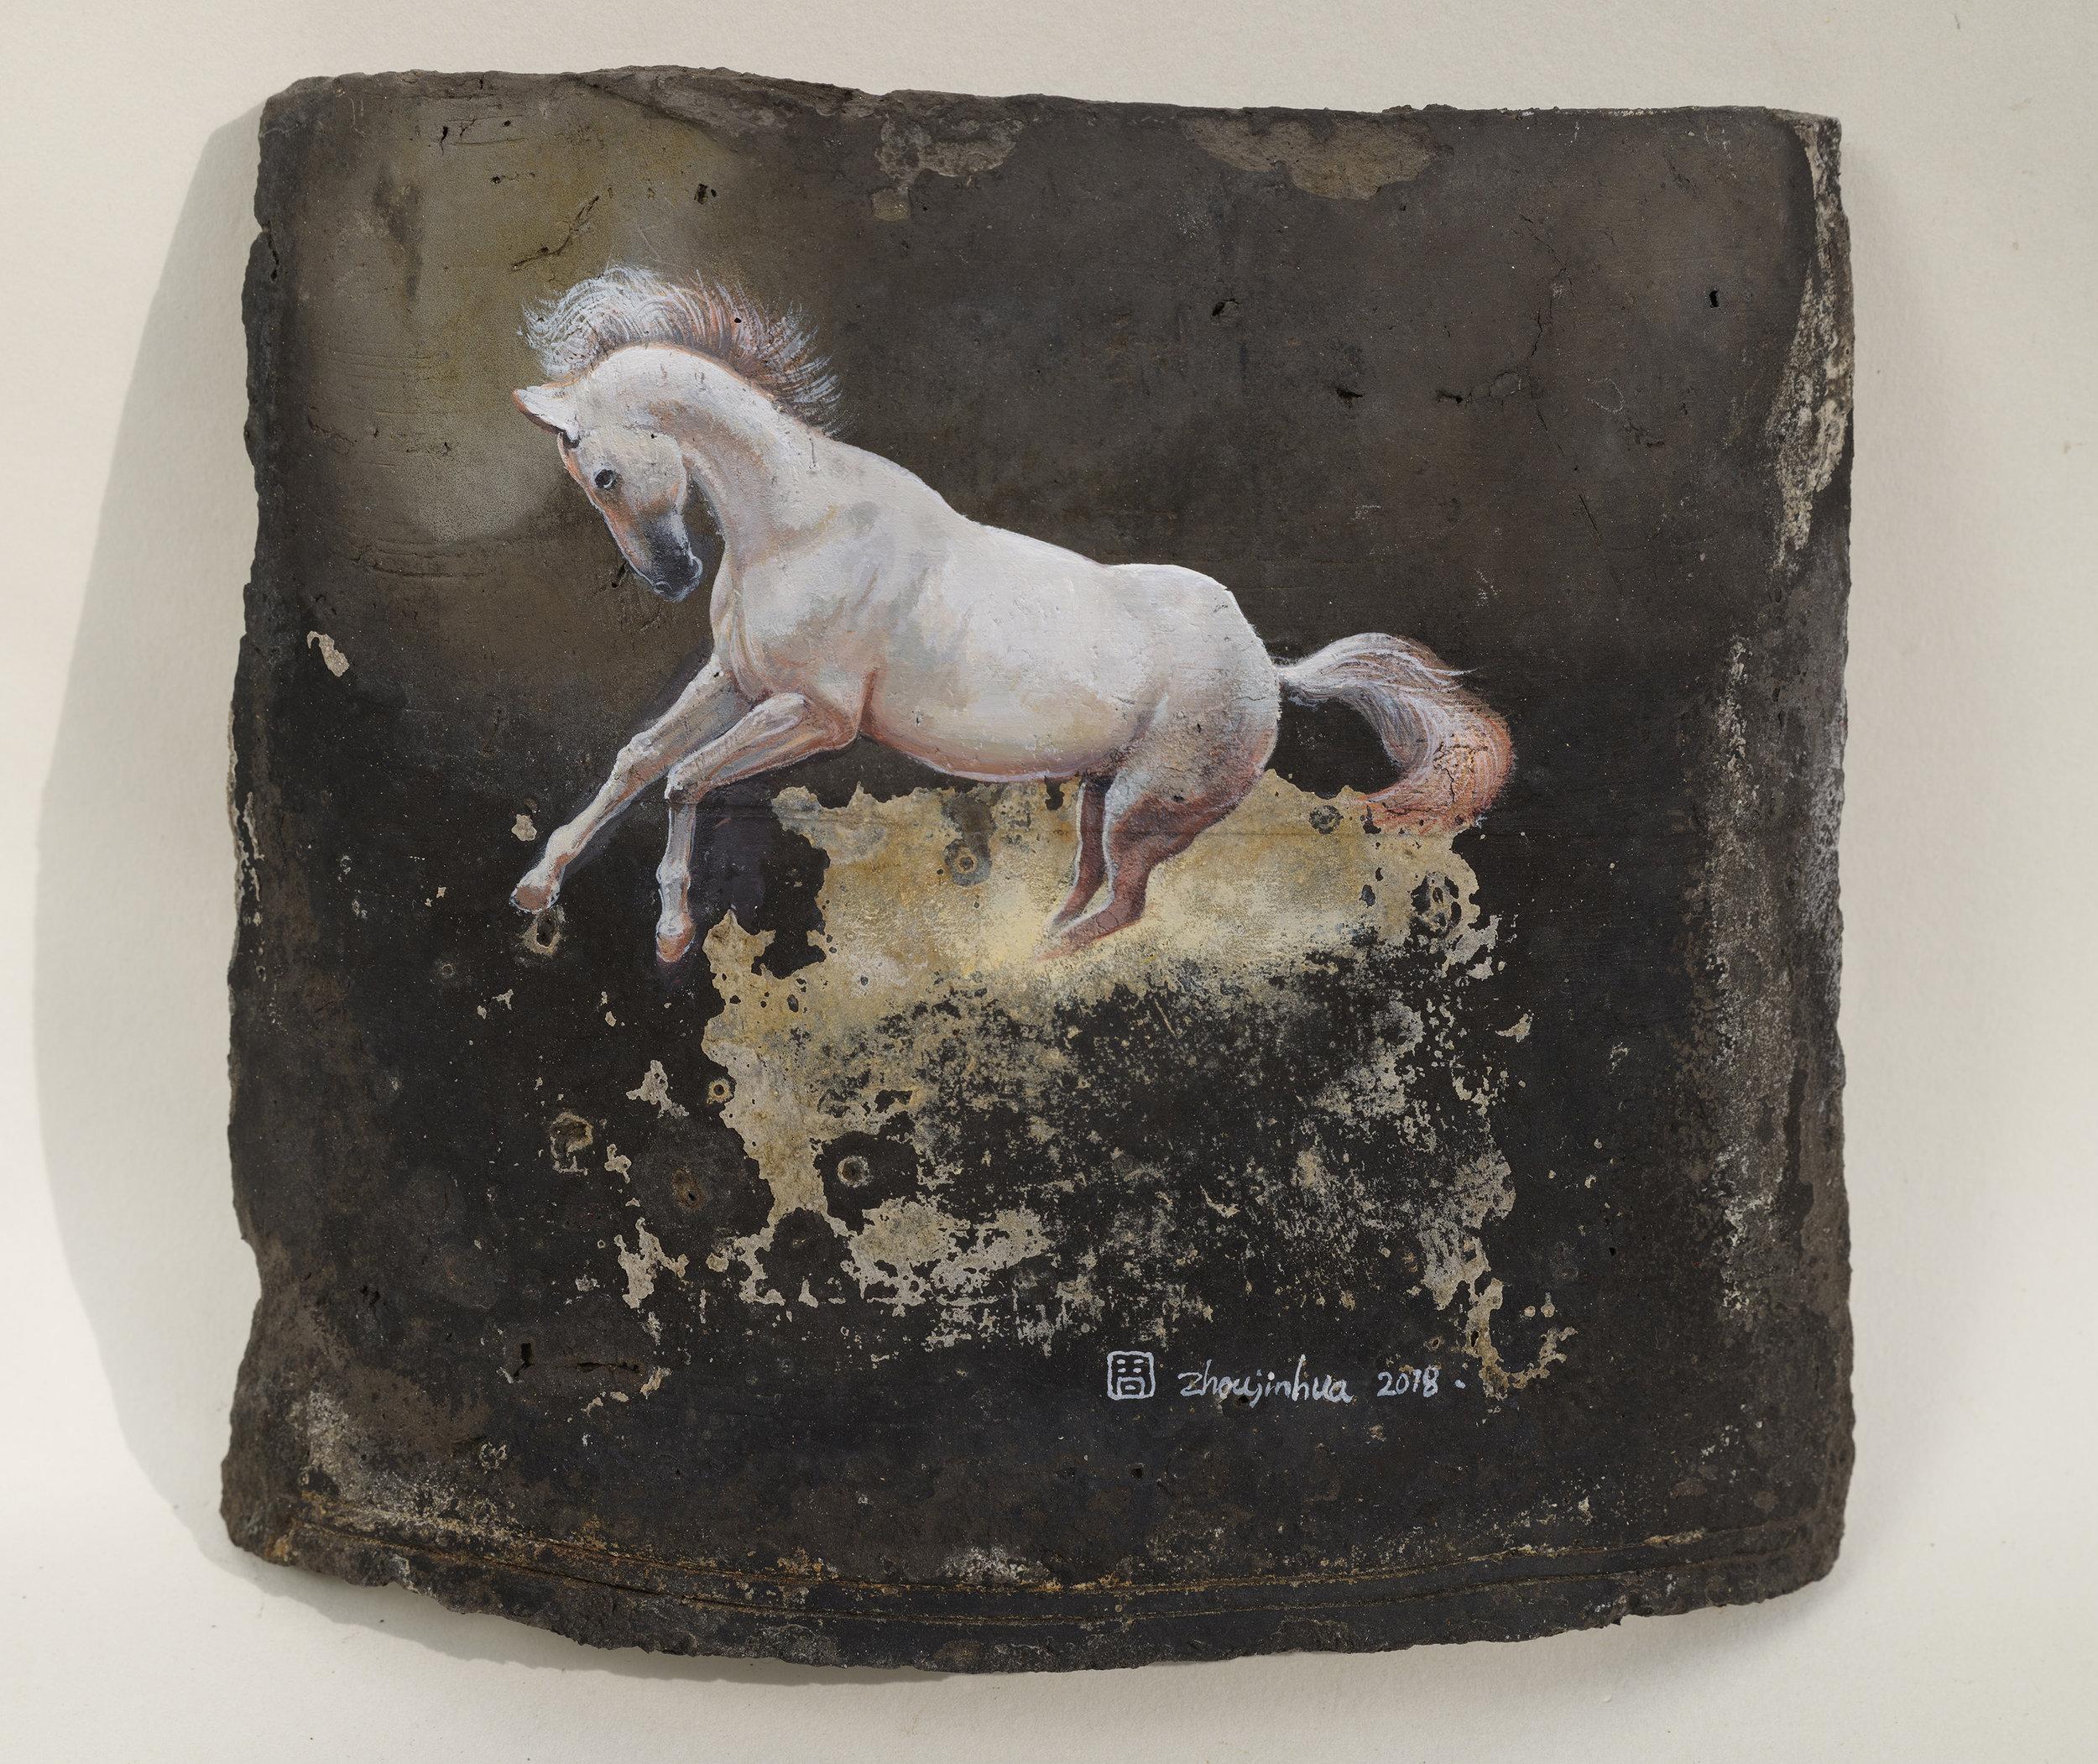 Zhou Jinhua 周金华, Remains of the Day 你我的痕迹 No.11, 2018, Acrylic on roof tile 瓦片、丙烯颜料, 17 x 19 cm